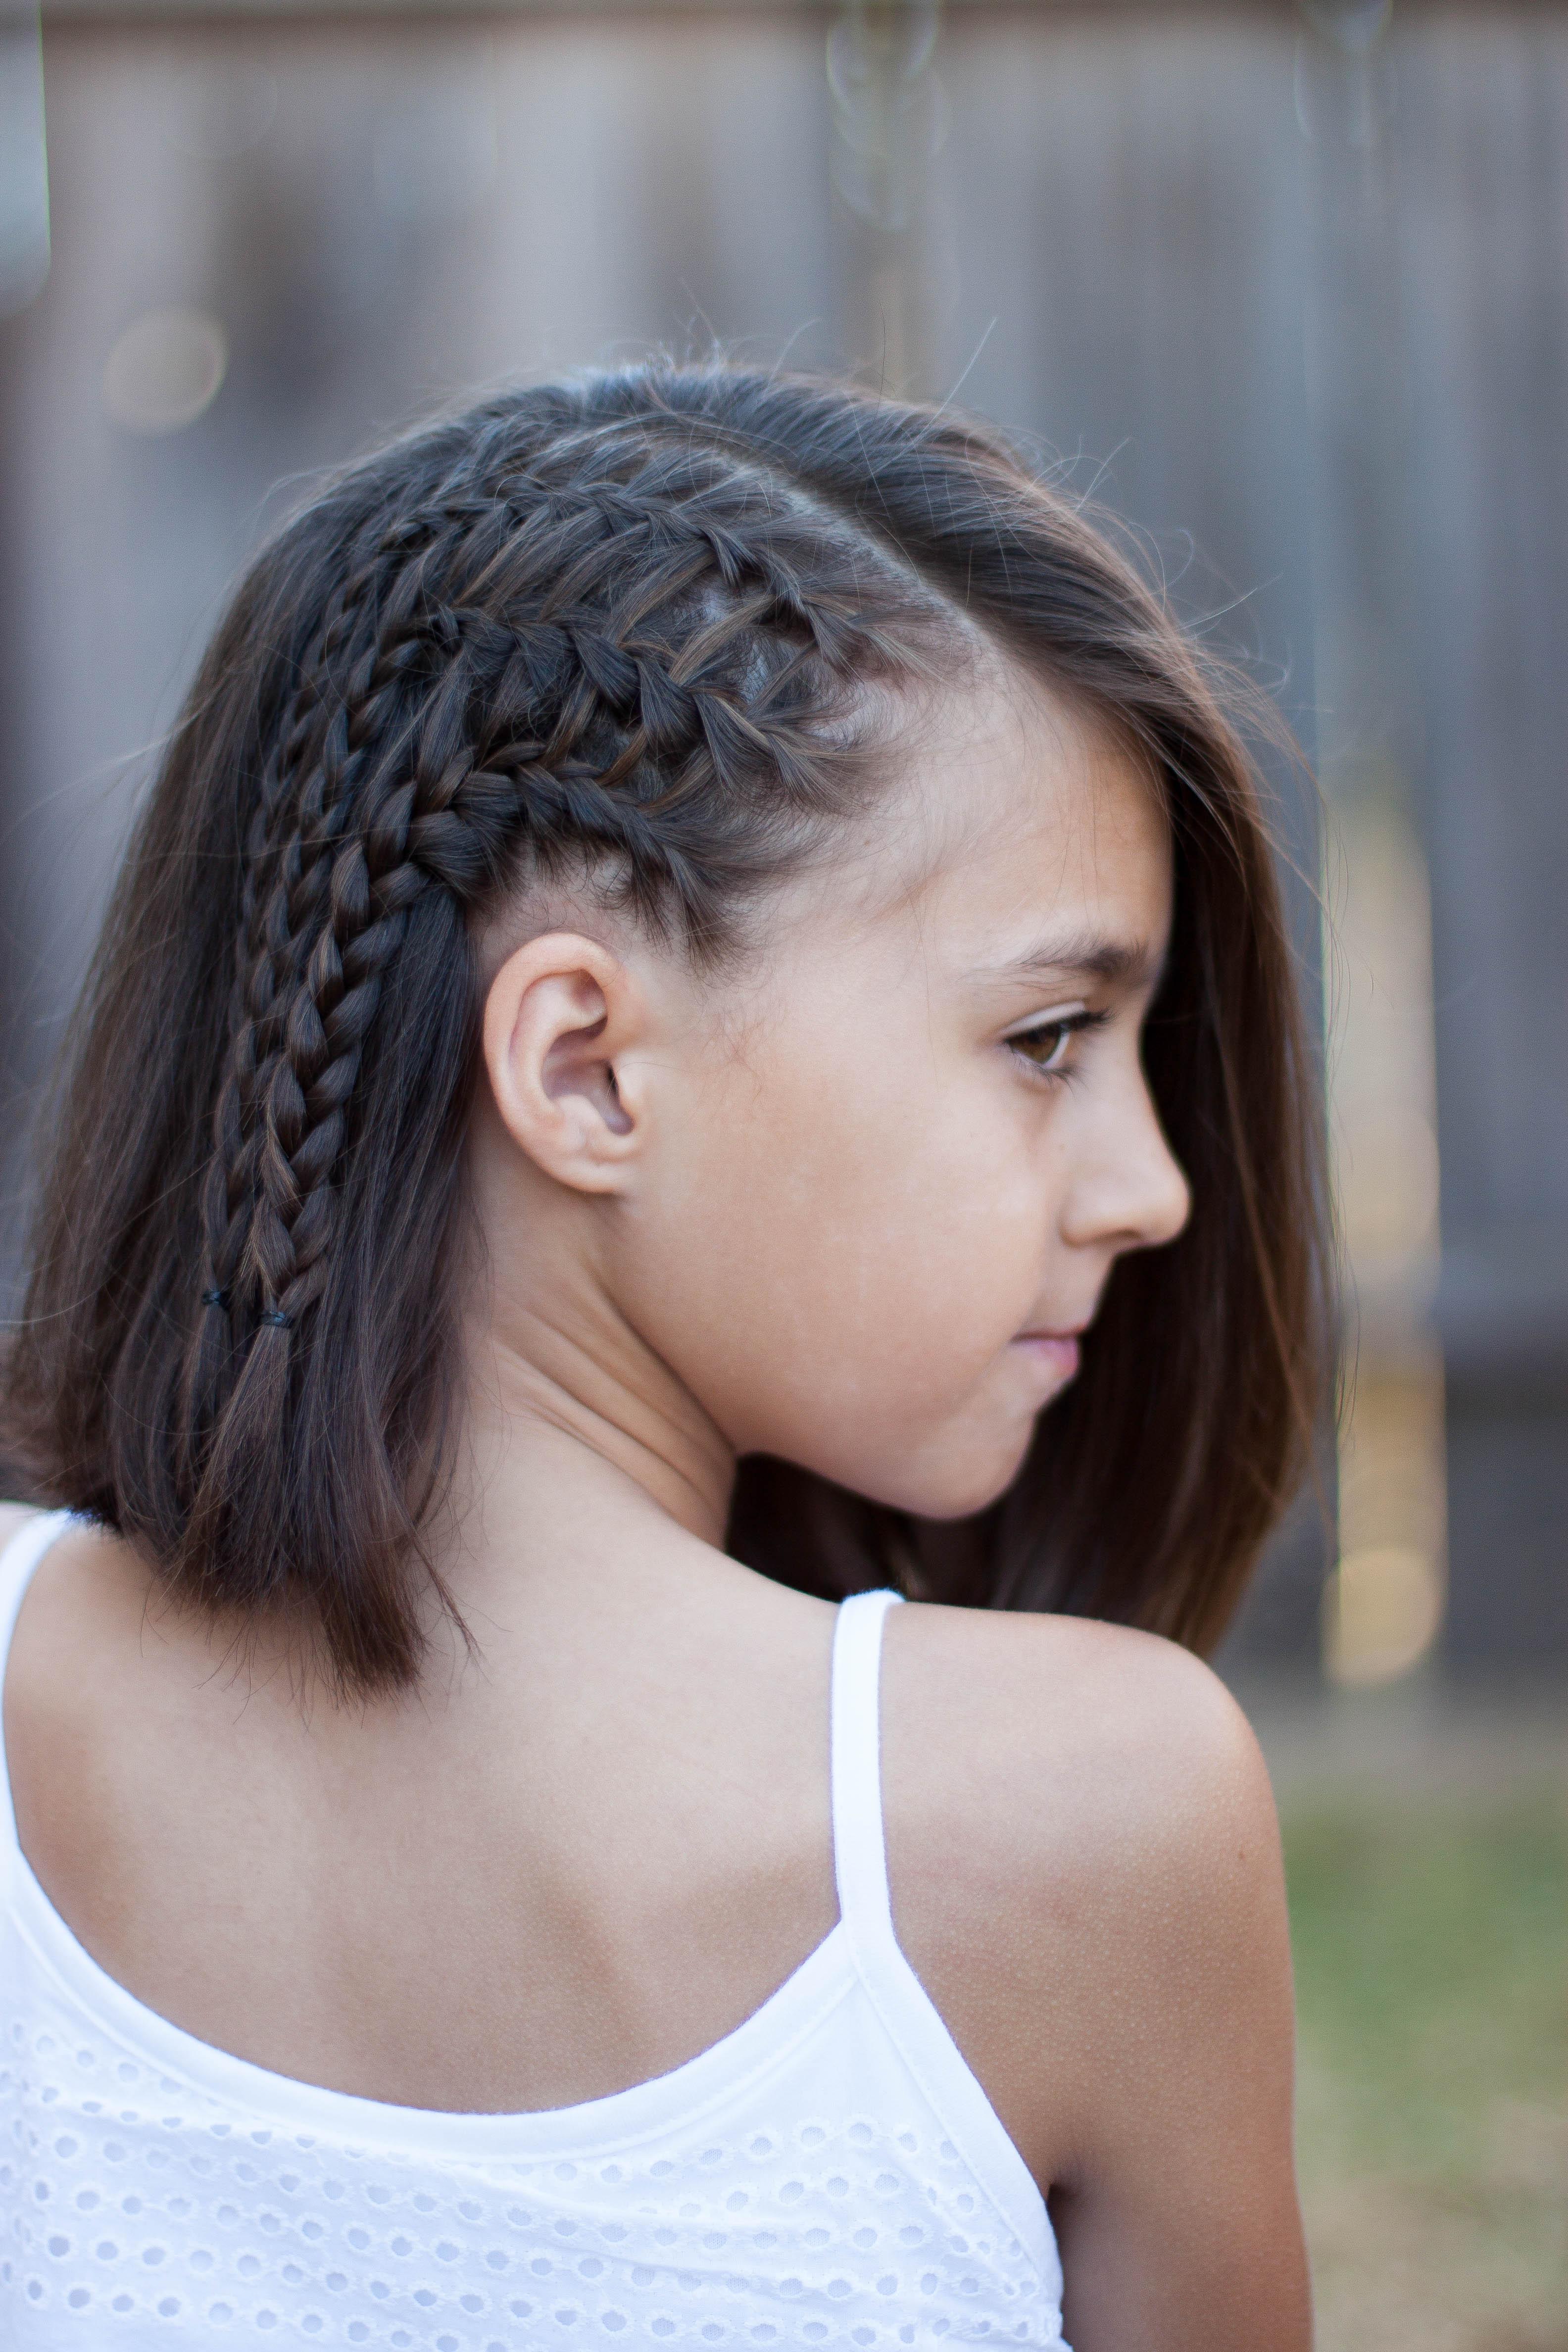 5 Braids For Short Hair | Cute Girls Hairstyles Throughout Cool Hairstyles For Short Hair Girl (View 13 of 25)